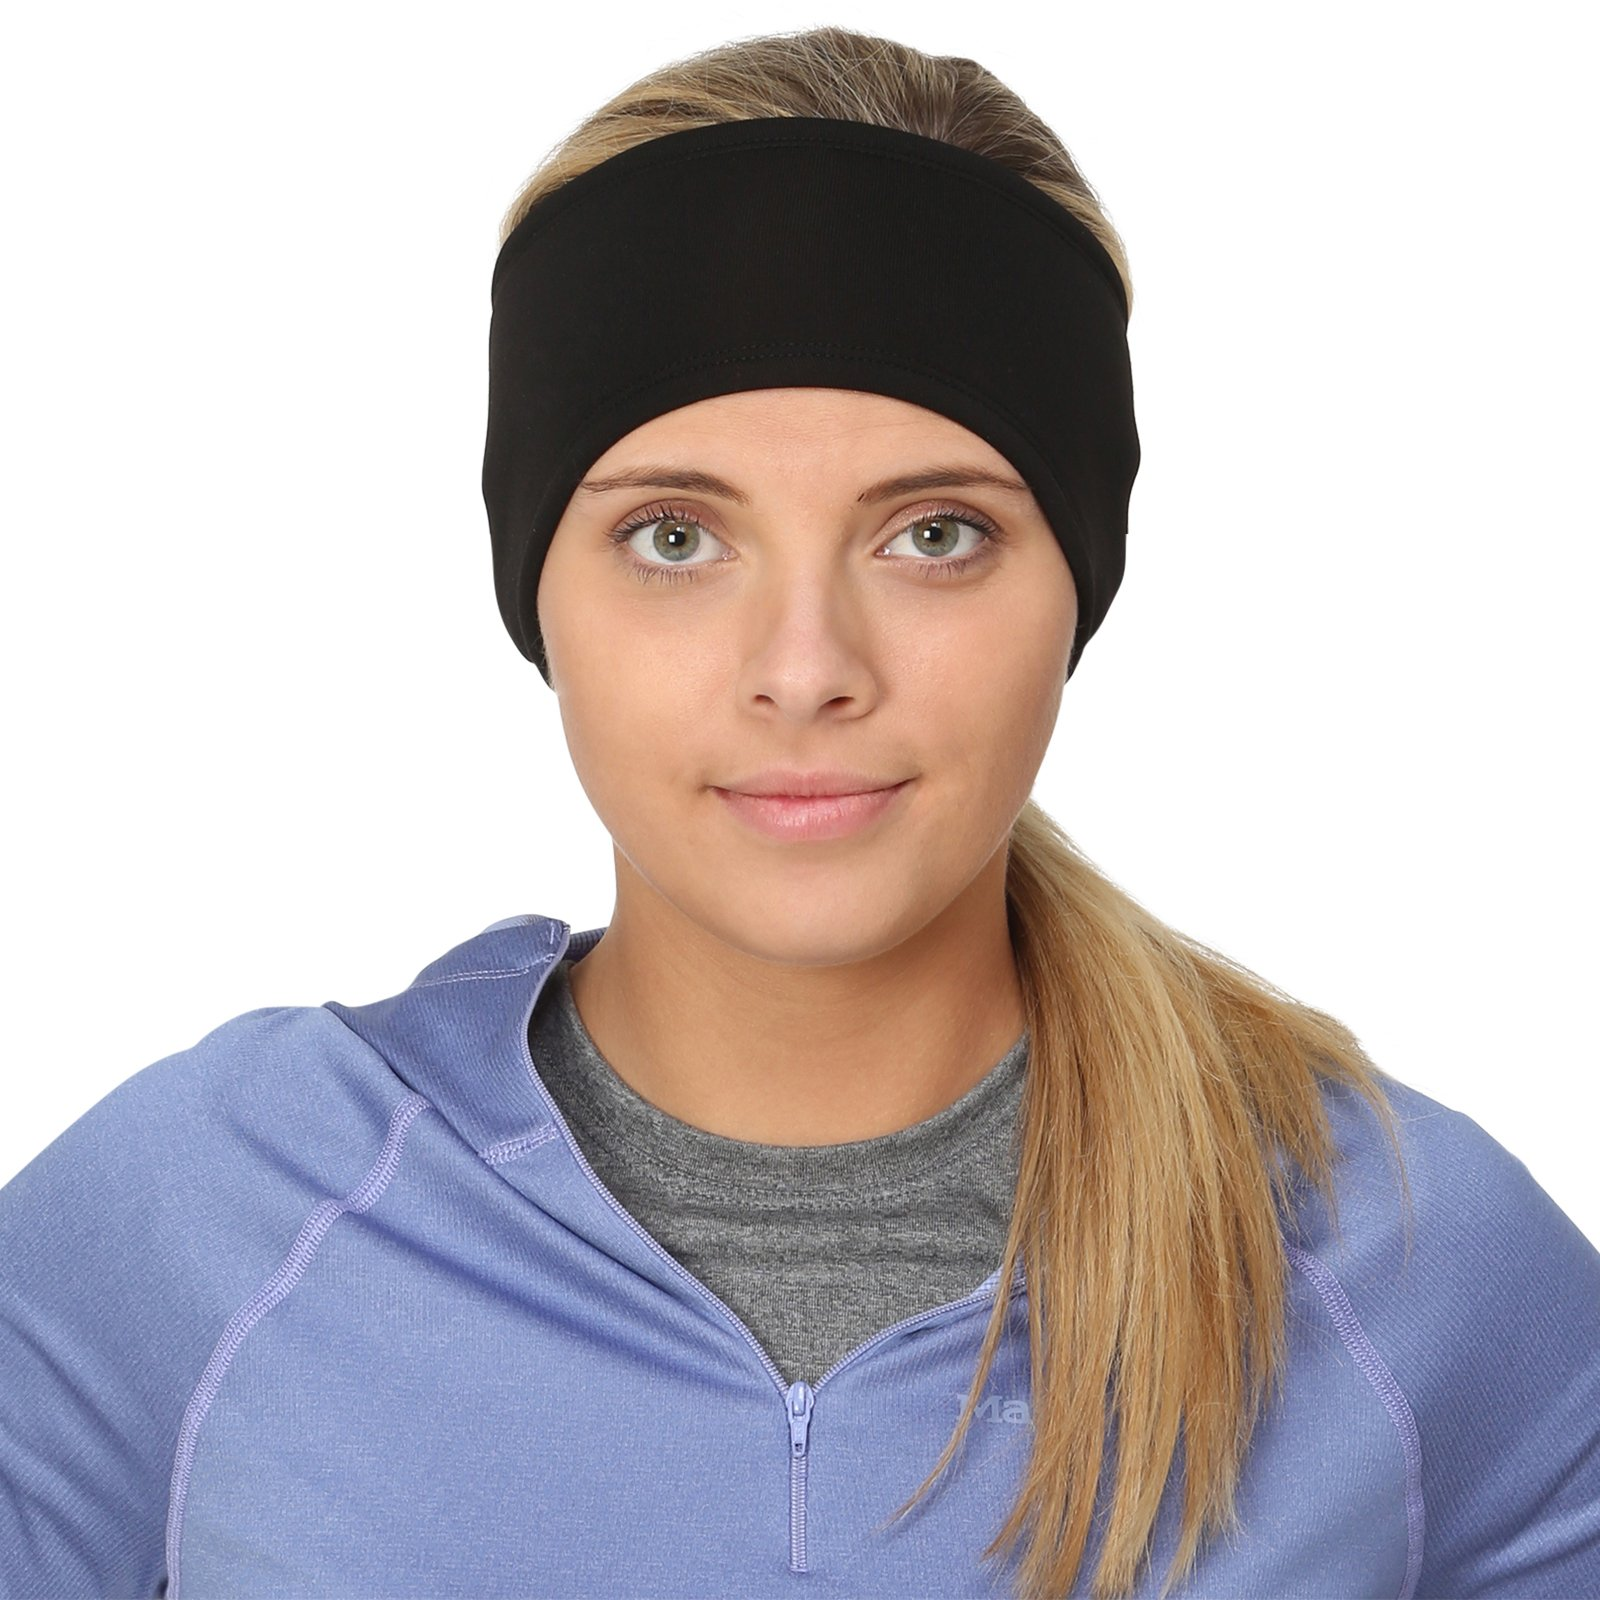 TrailHeads Women's Ponytail Headband | Moisture Wicking Ear Band | The Power Running Headband - Black by TrailHeads